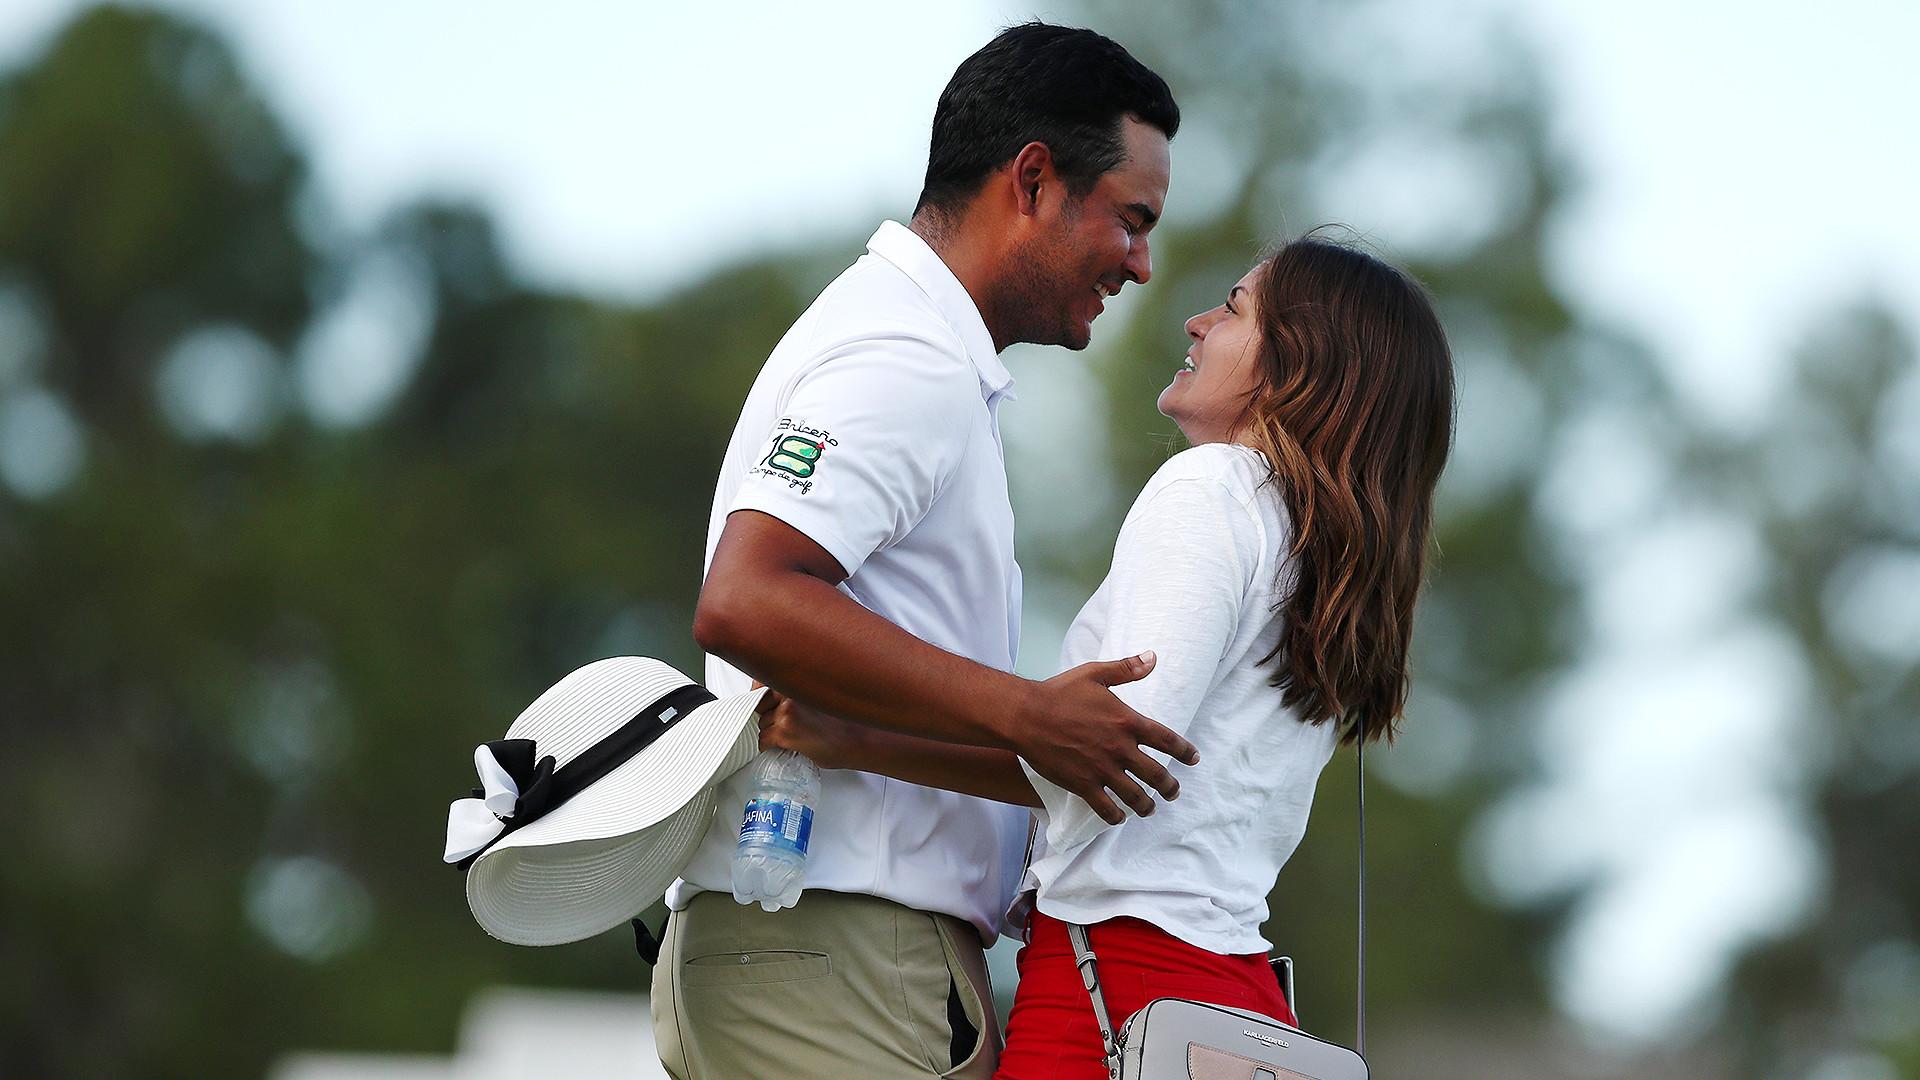 Sanderson Farms Purse Payout Sebastian Munoz Earns More Than Last Season Golf Channel